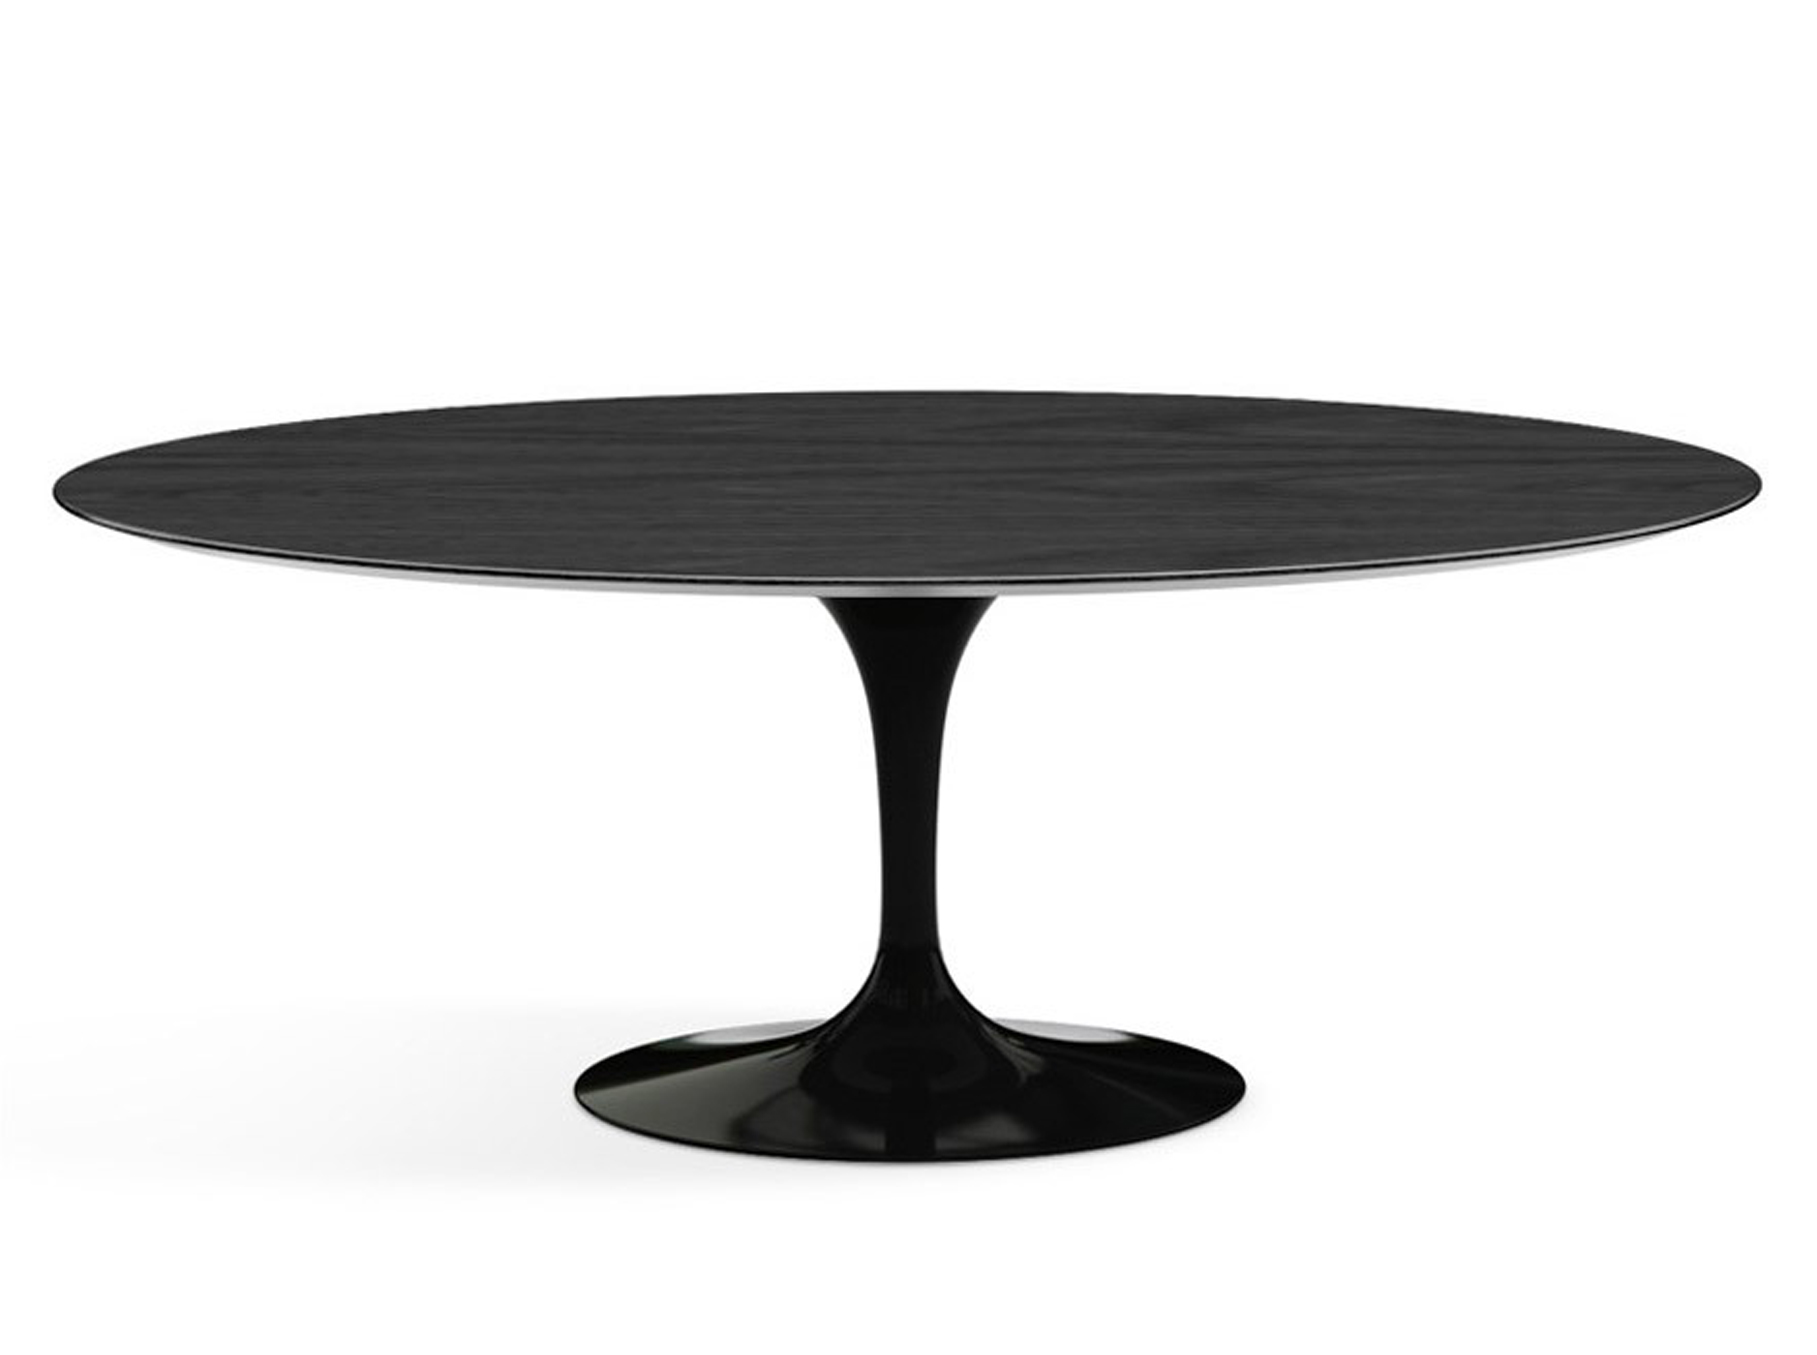 Кухонный стол ActualDesign 9981438 от thefurnish